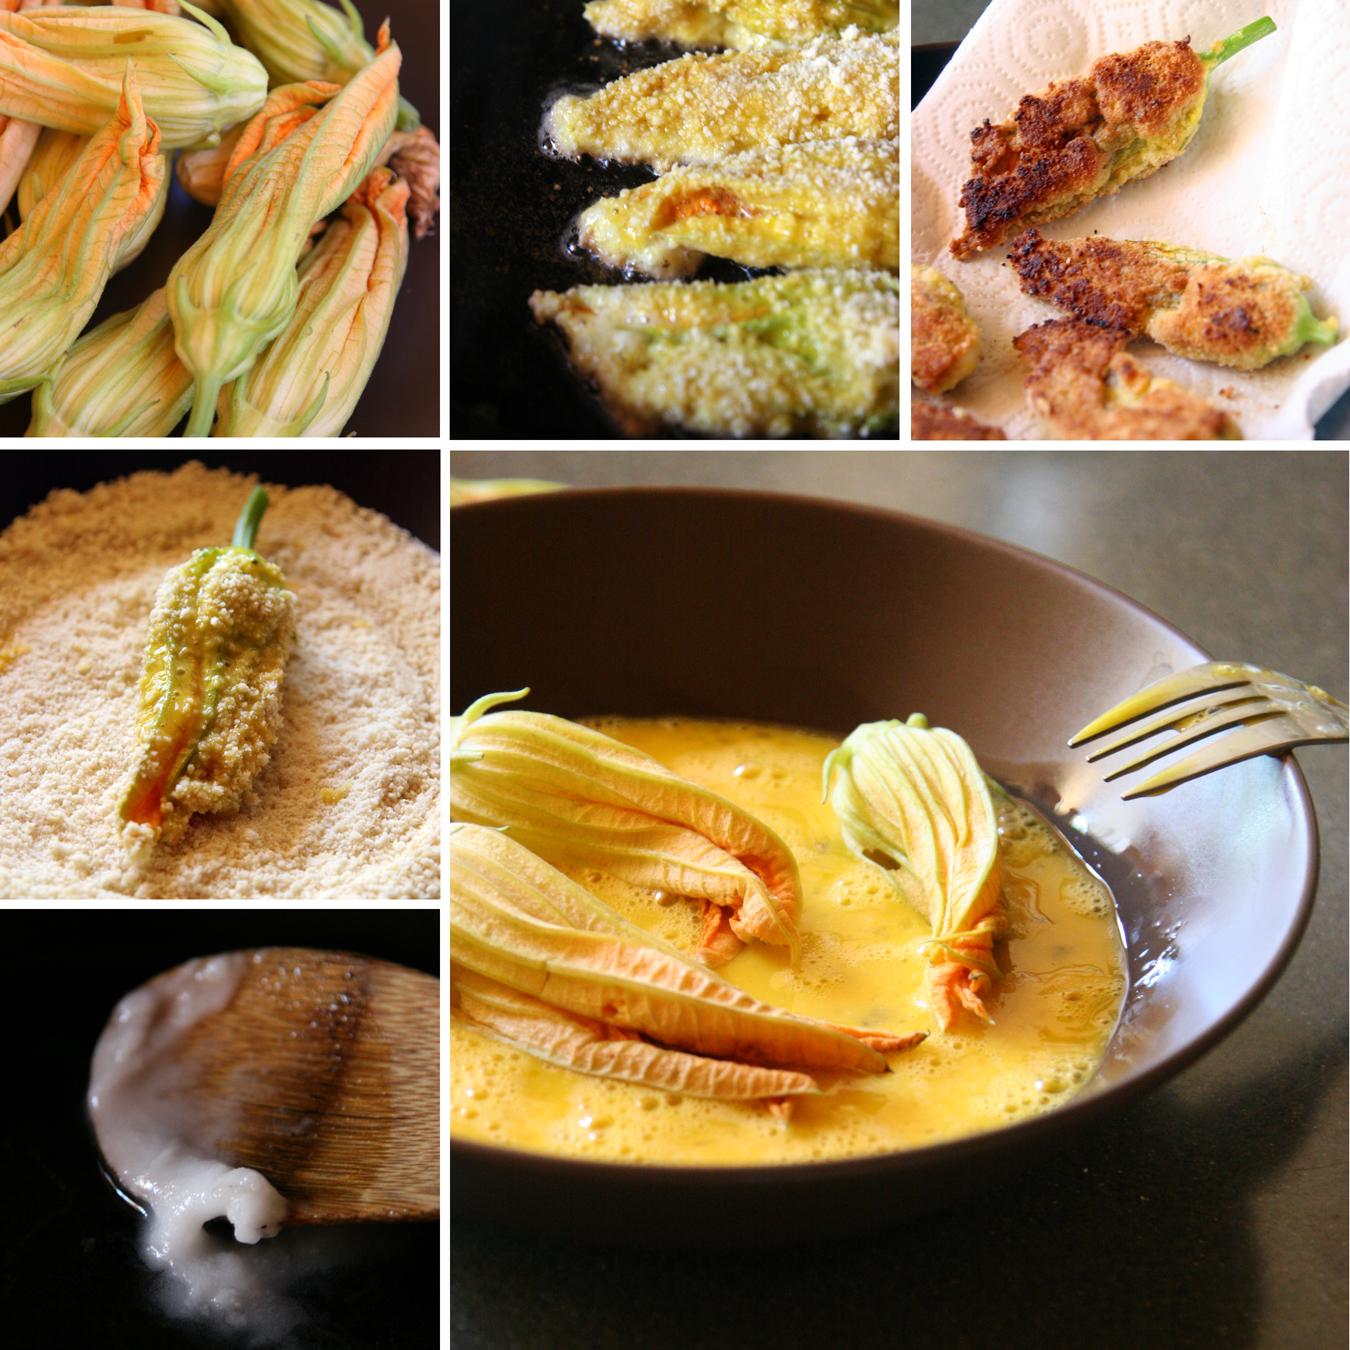 Zucchini Blossom Appetizer Paleo and Gluten Free